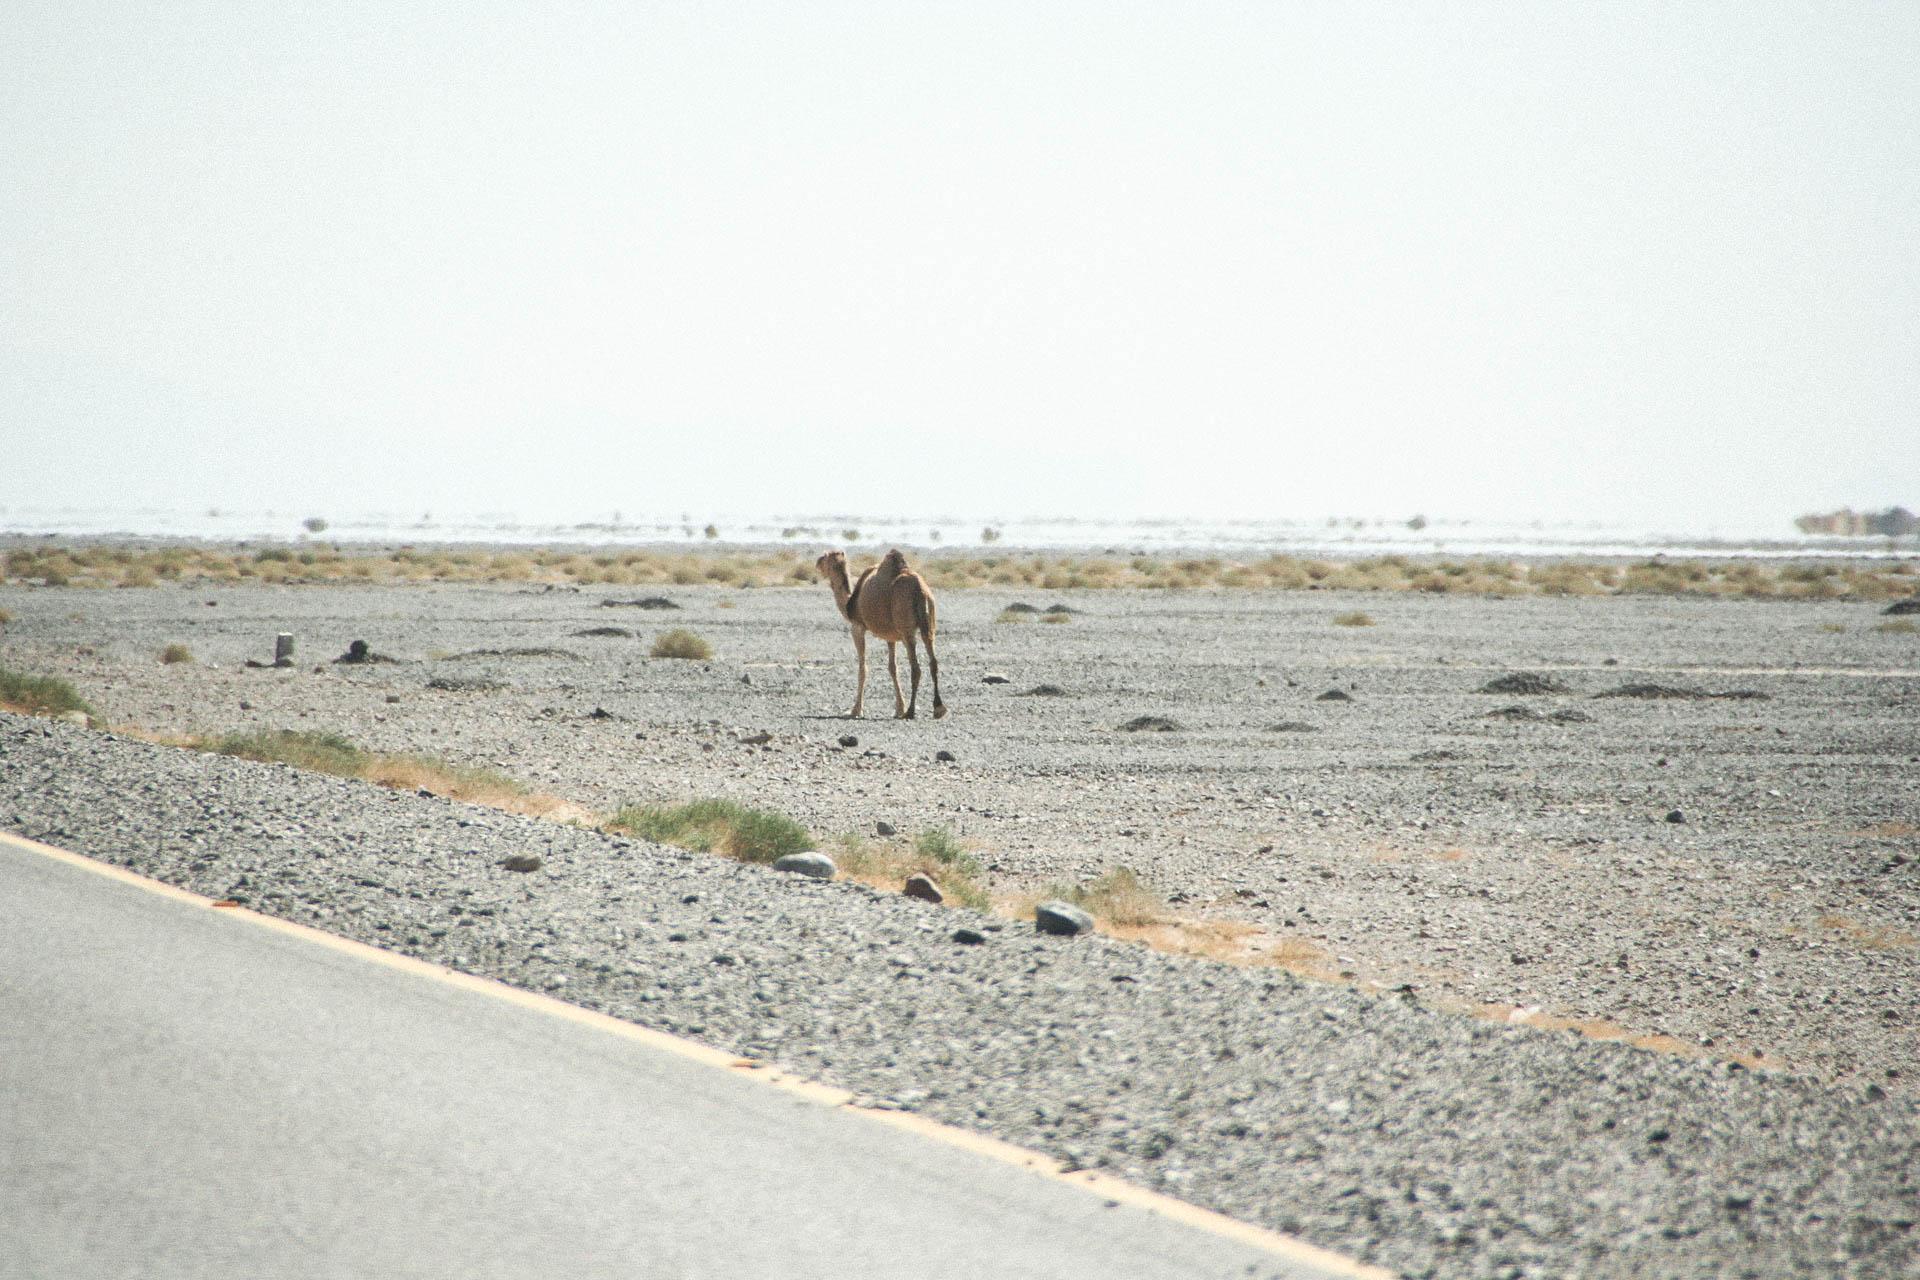 Kamel am Strassenrand